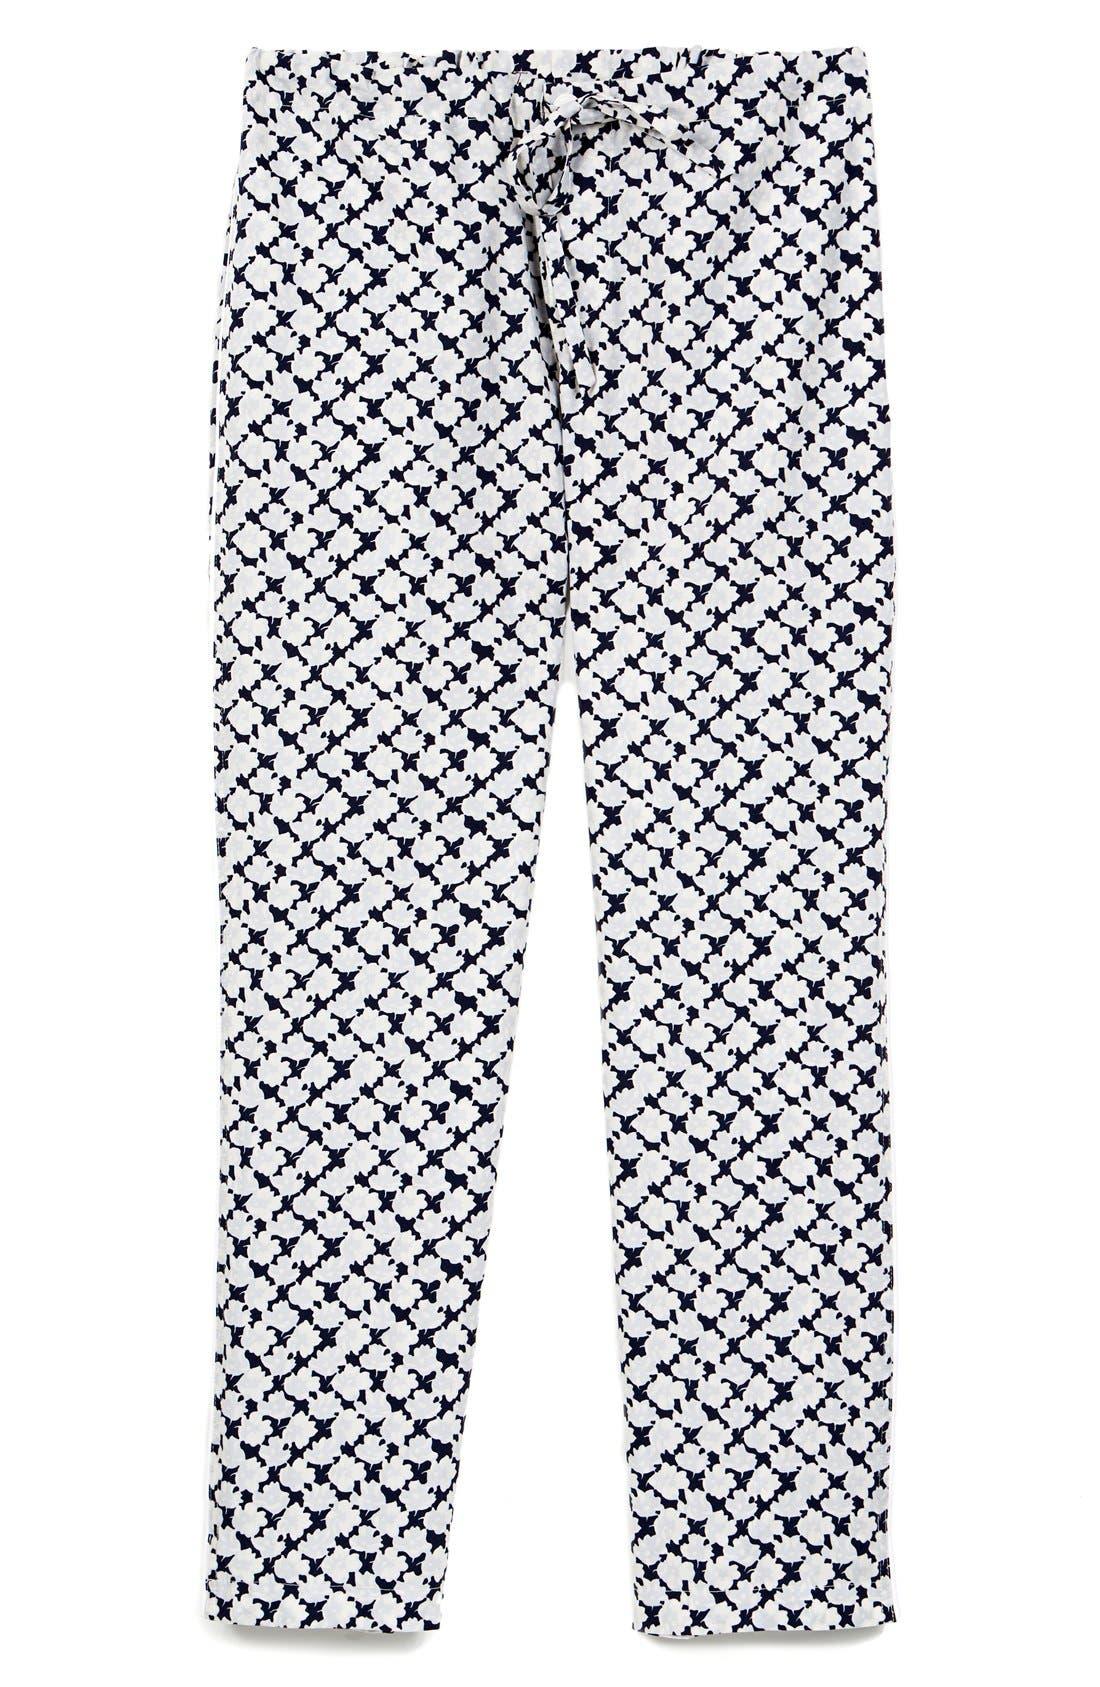 SLEEPY JONES 'Marina' Pajama Pants, Main, color, 415